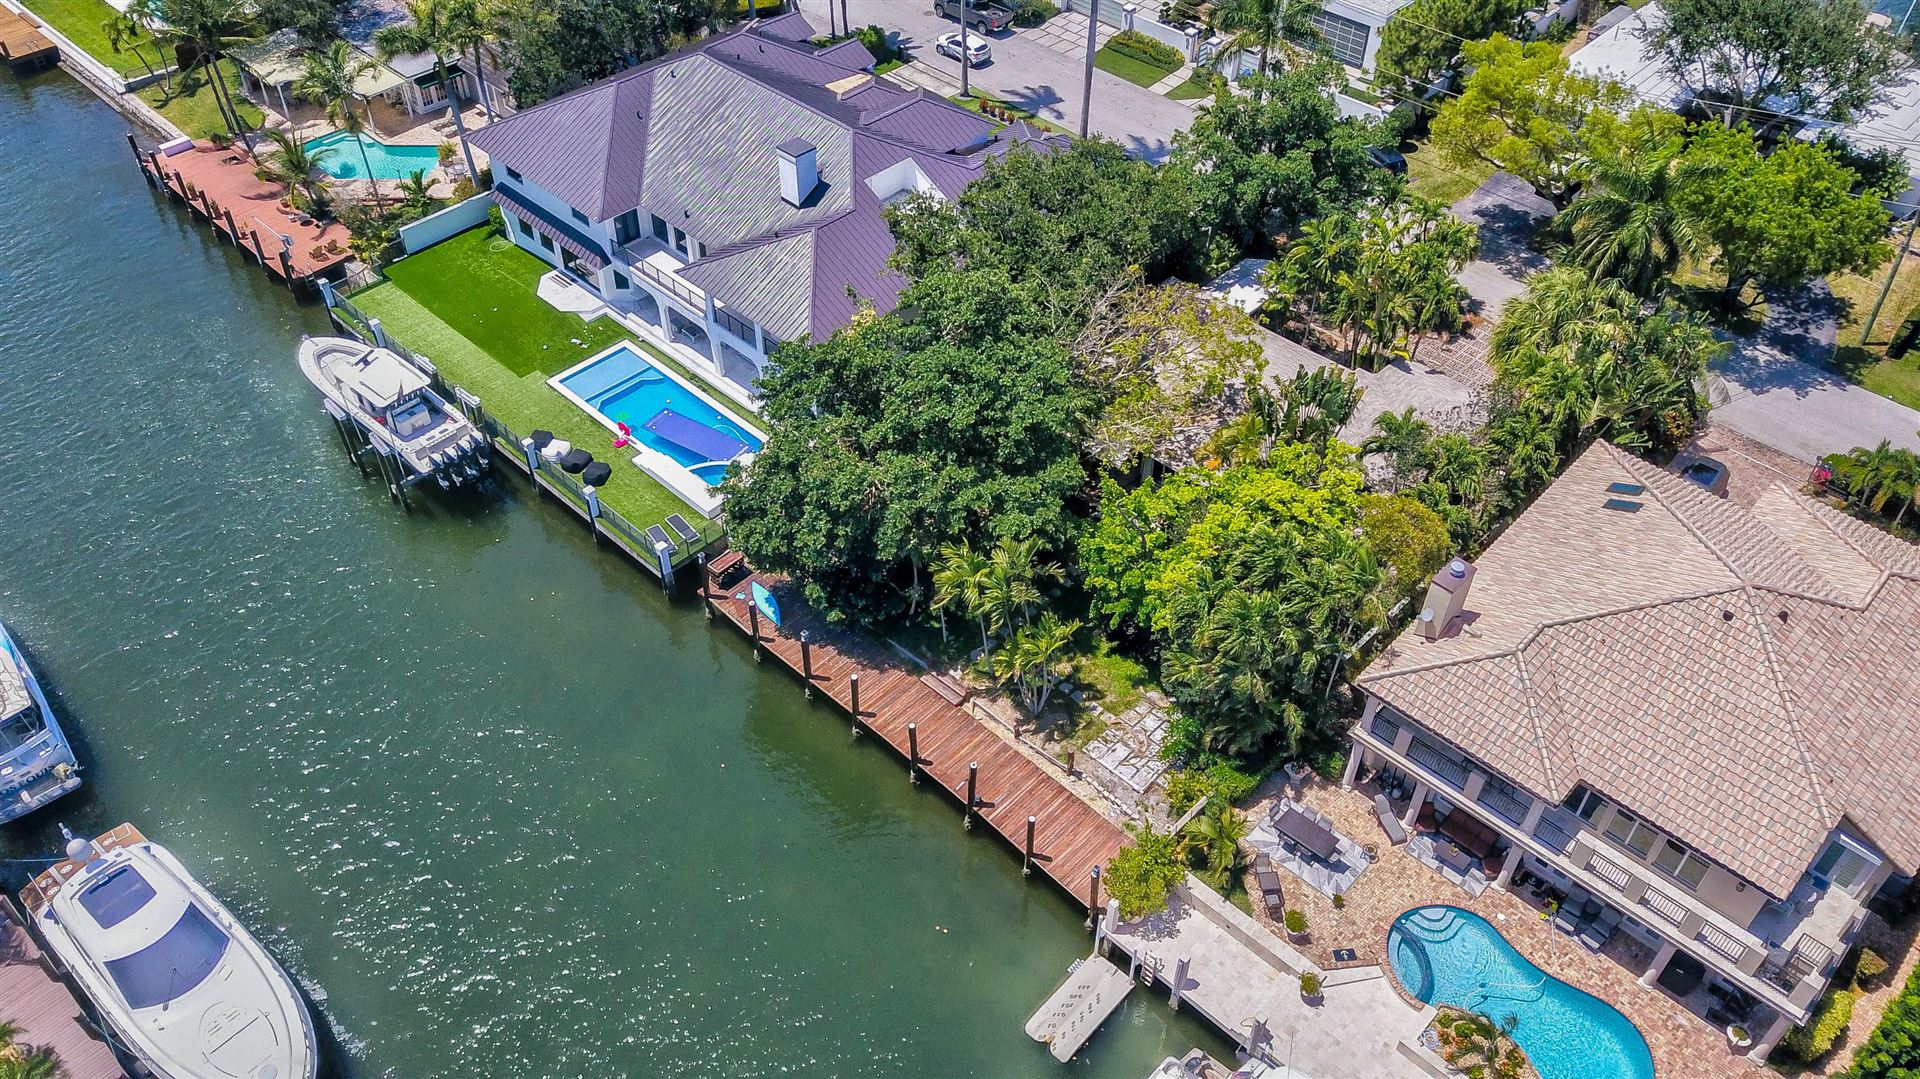 Photo of 2508 Delmar Place, Fort Lauderdale, FL 33301 (MLS # RX-10711892)